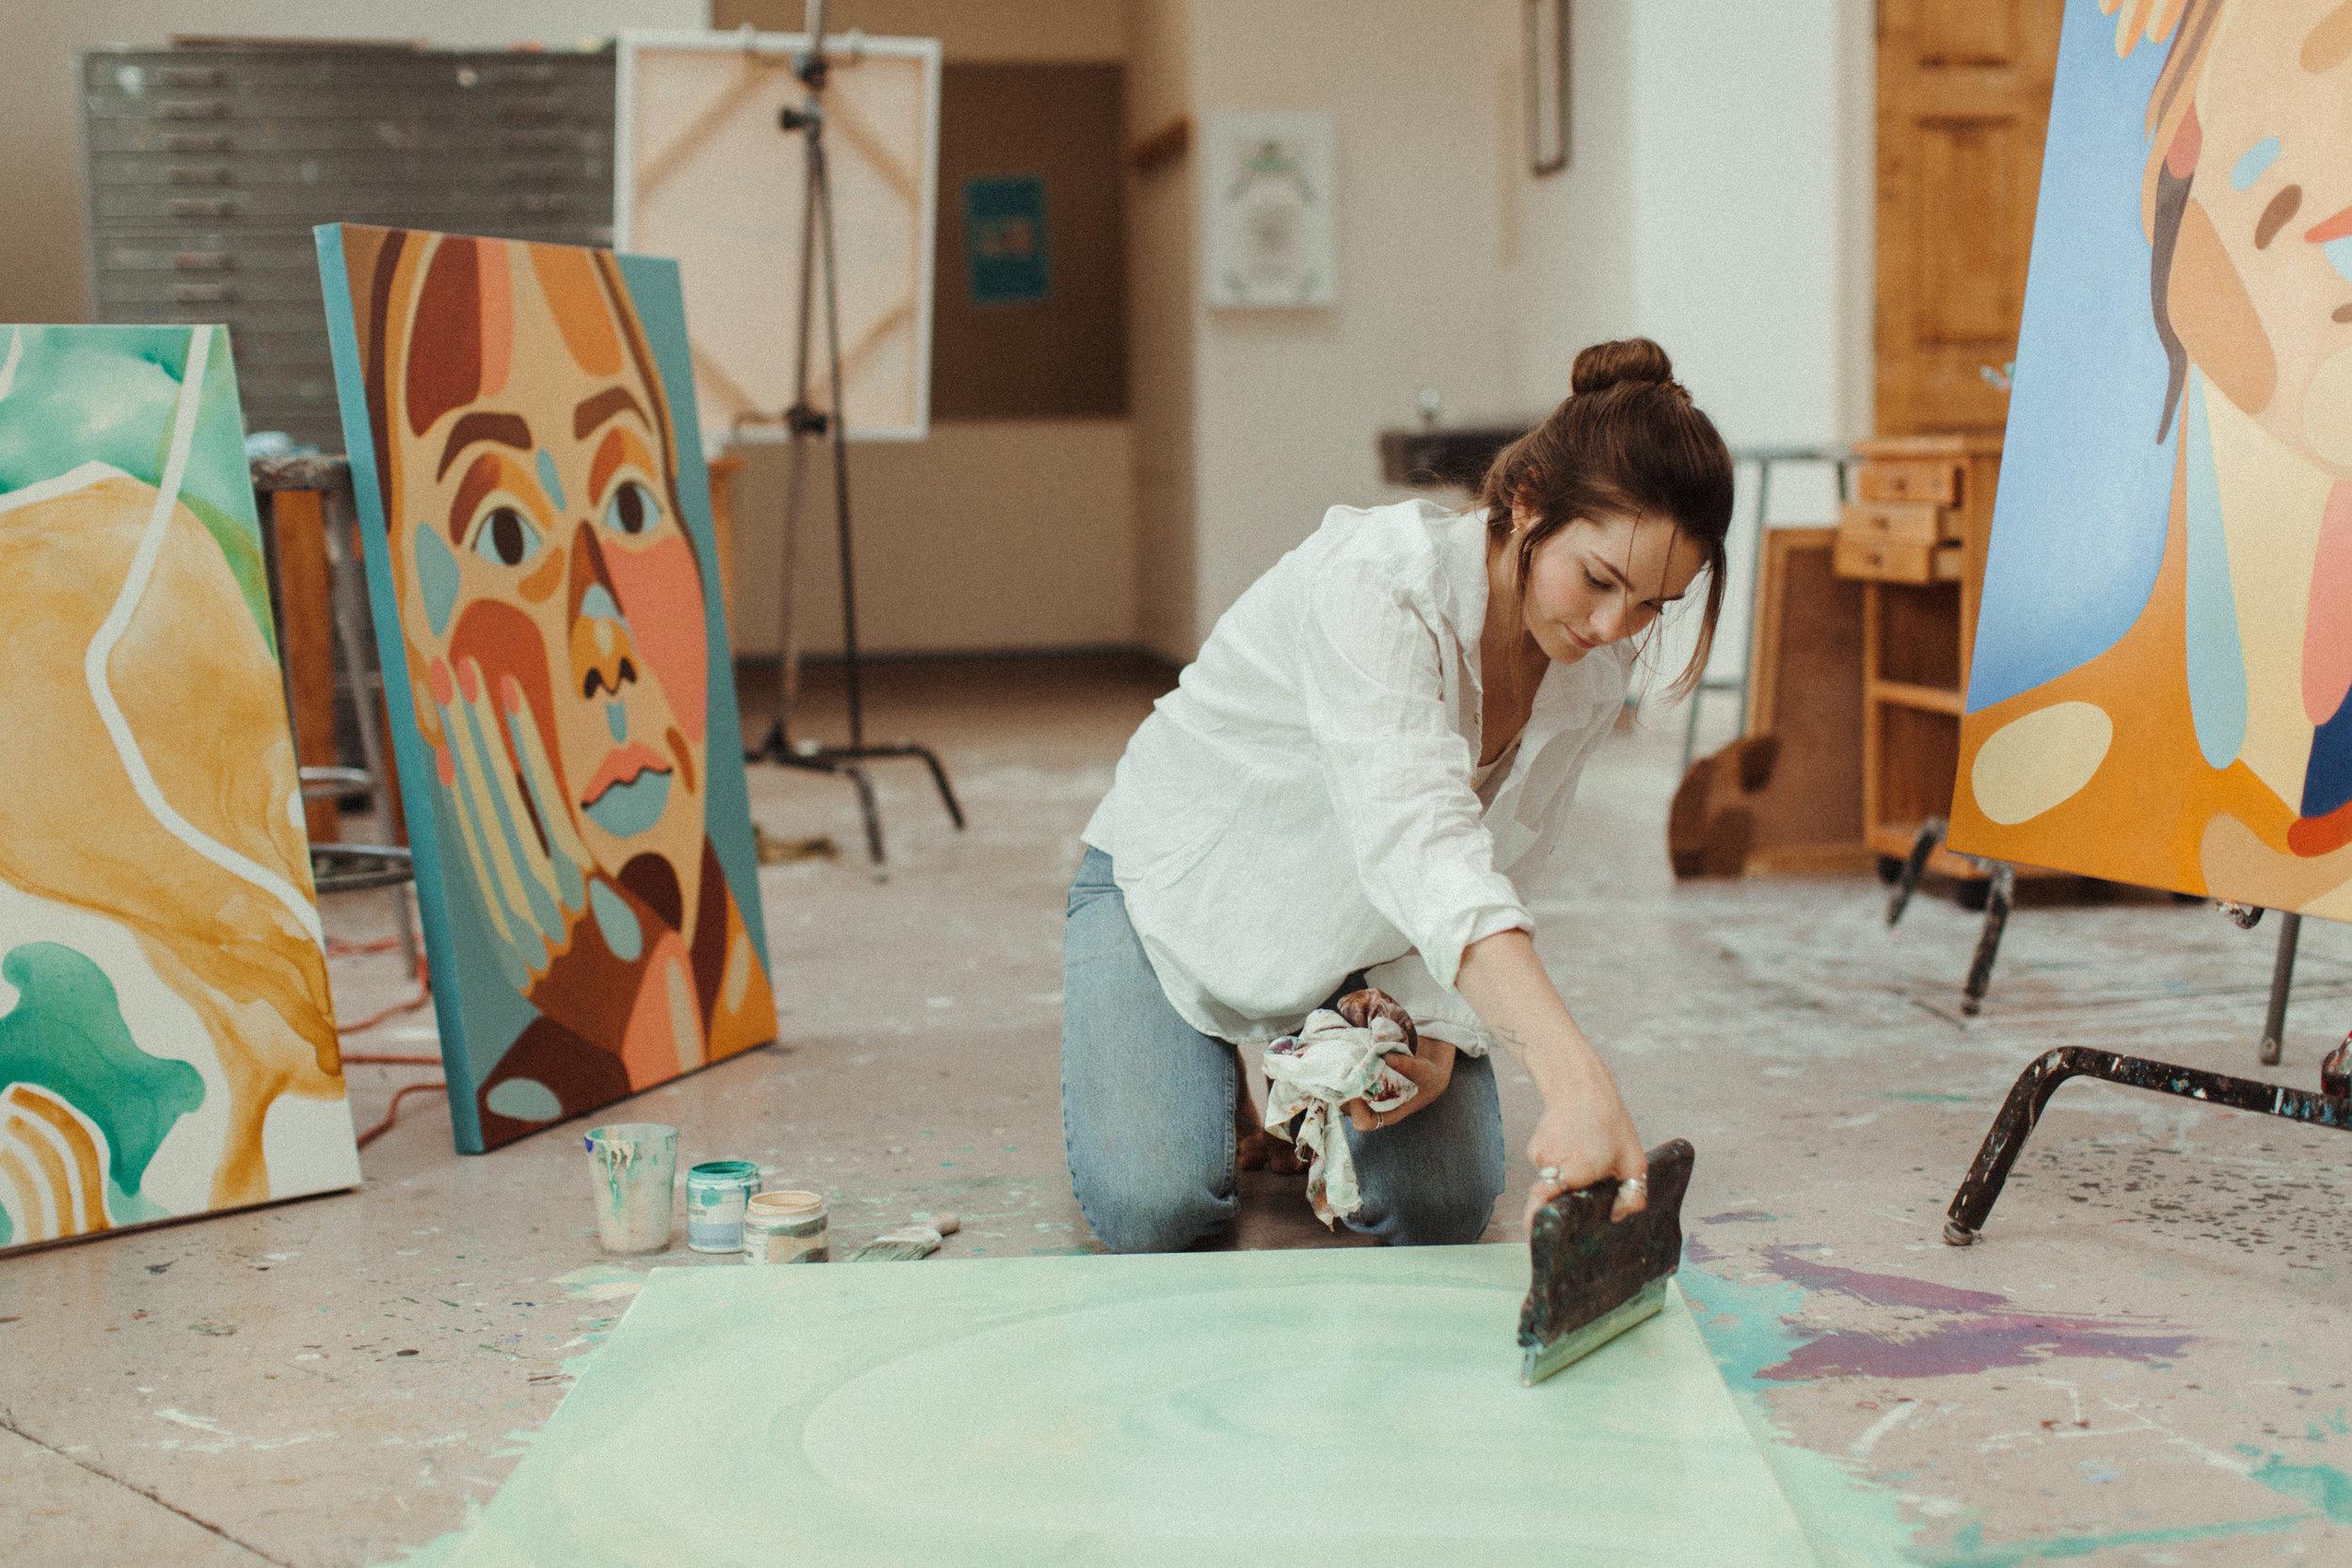 emily-pawlica-art-process-2019-peytoncurry-0463.jpg